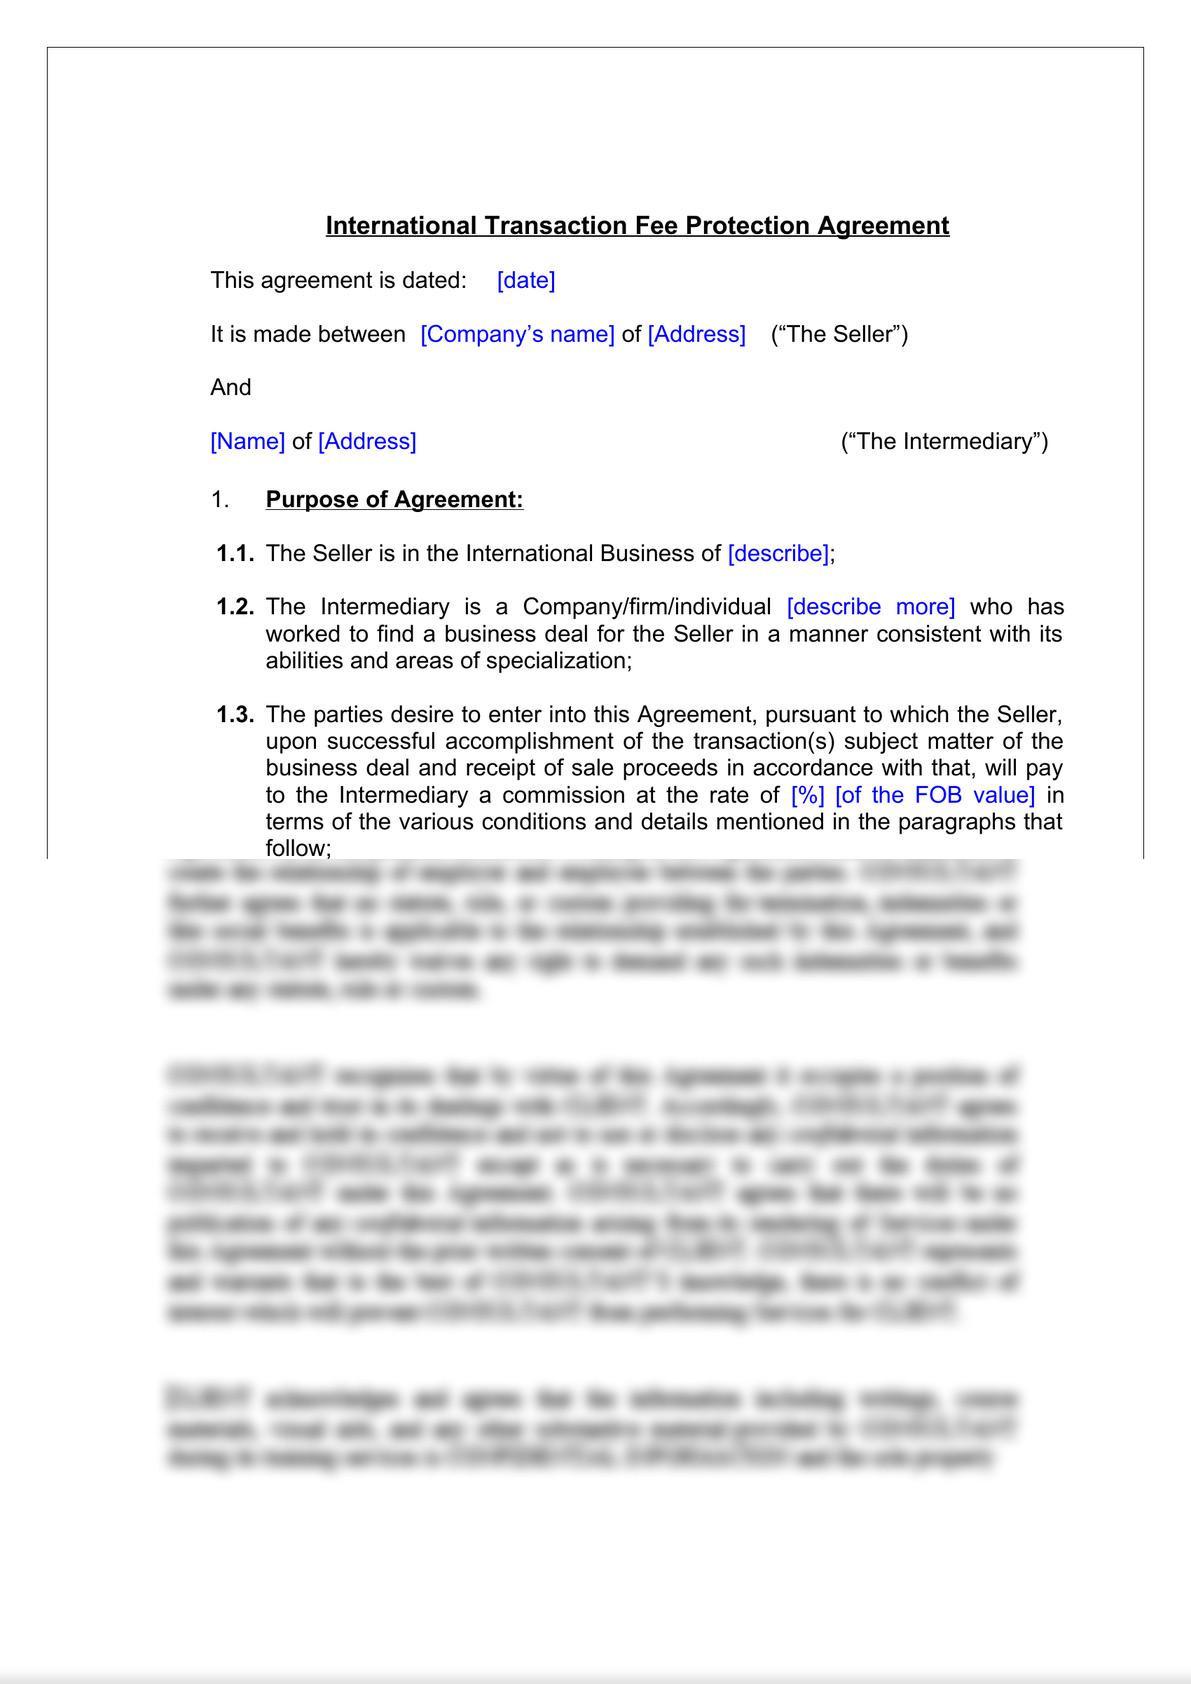 International Transaction Fee Protection Agreement-2